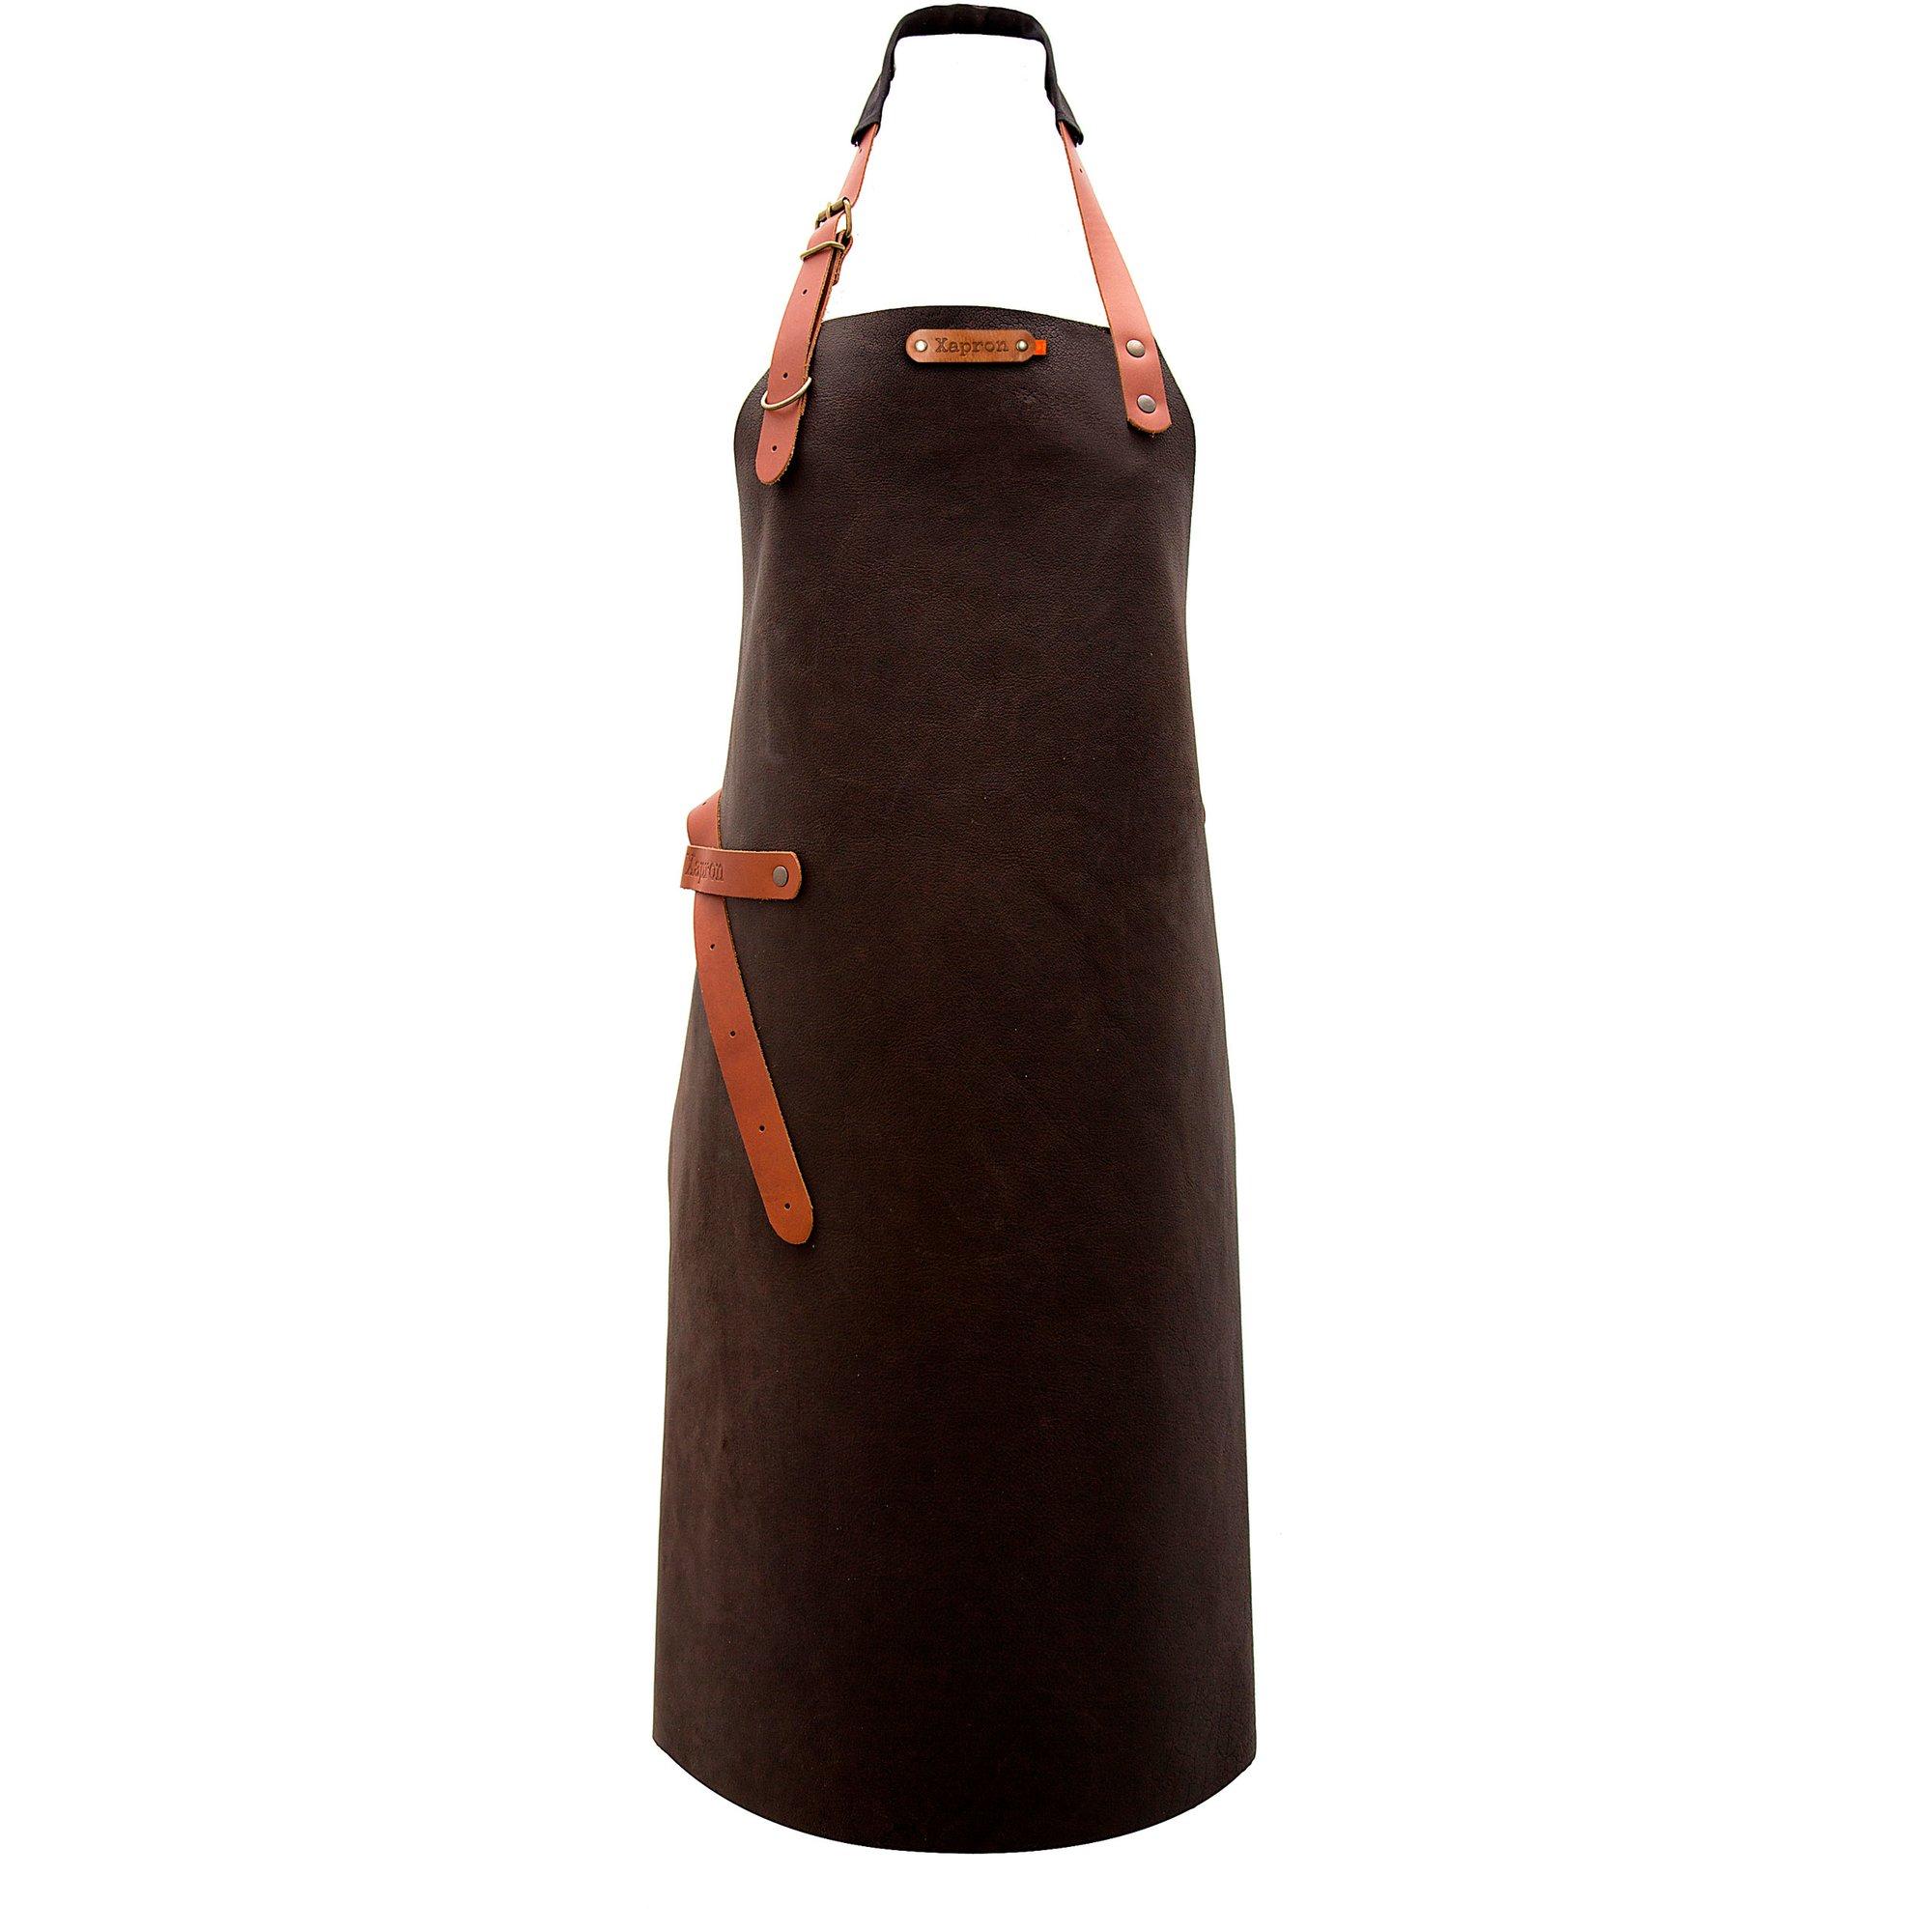 Xapron Utah förkläde i choco XL